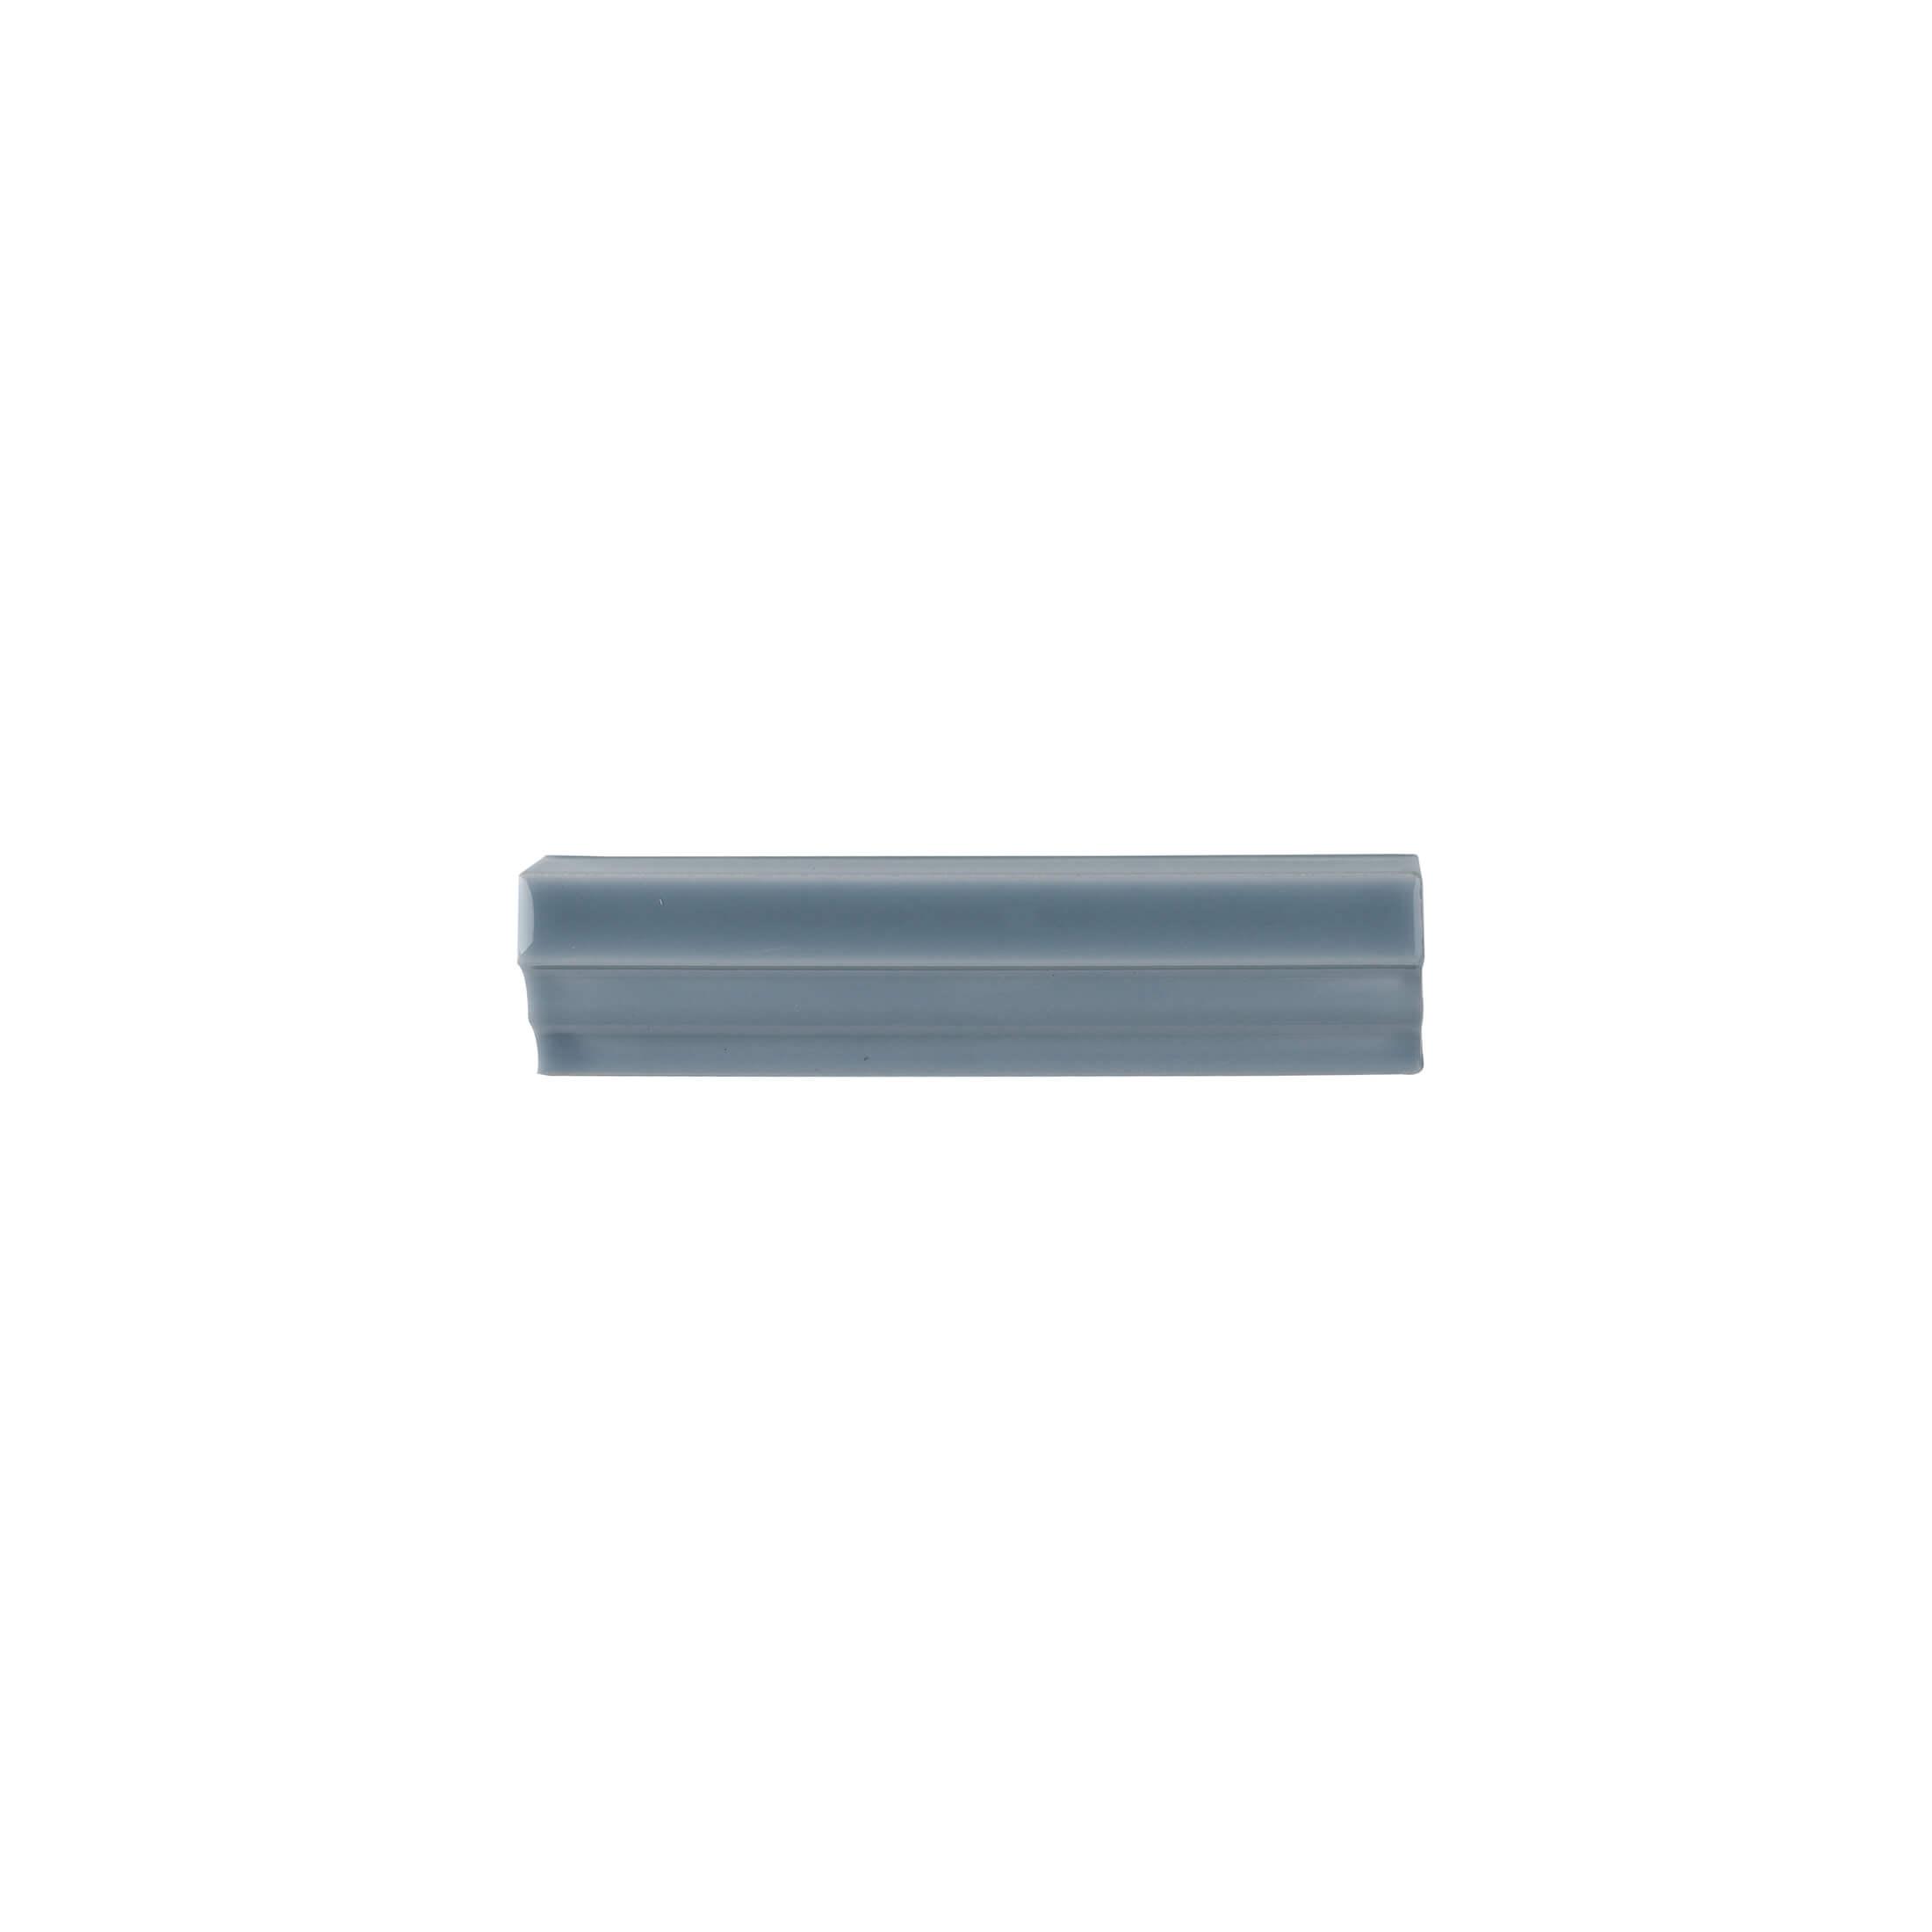 ADNE5599 - CORNISA CLASICA - 3,5 cm X 15 cm